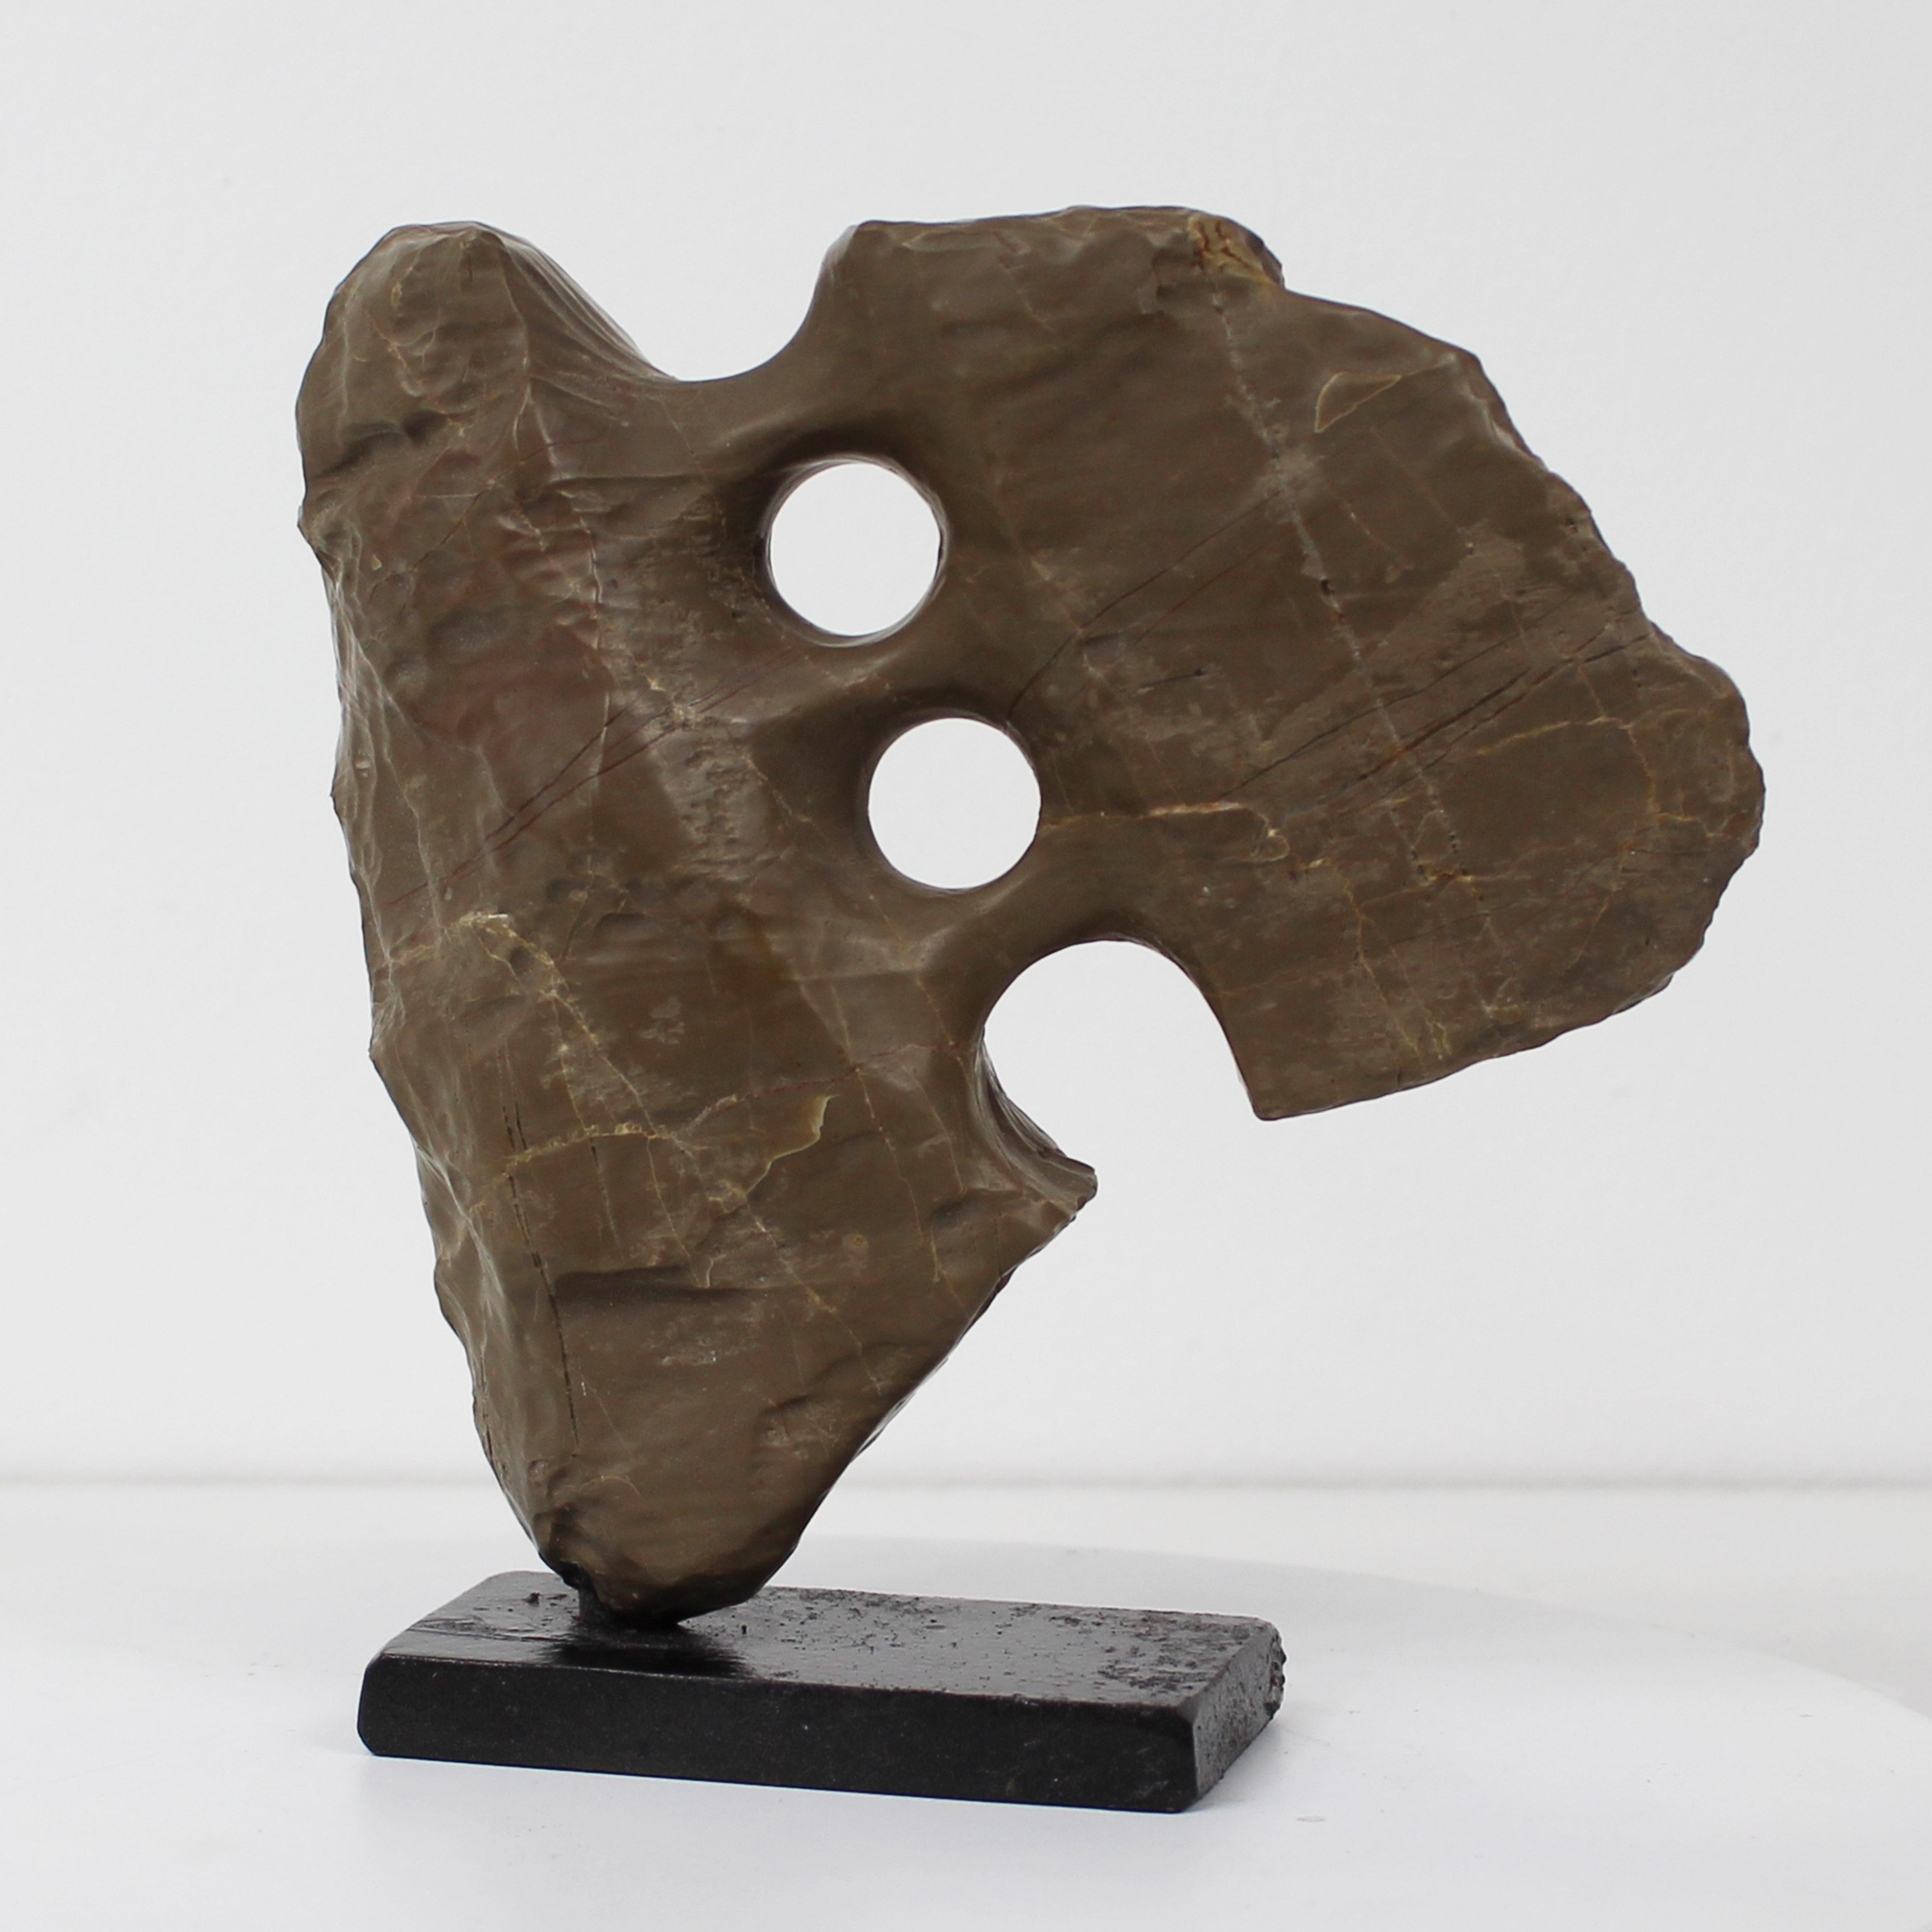 Gilbert Frizon - 90 Ex-tension XC - Sculpture calcaire - Exposit